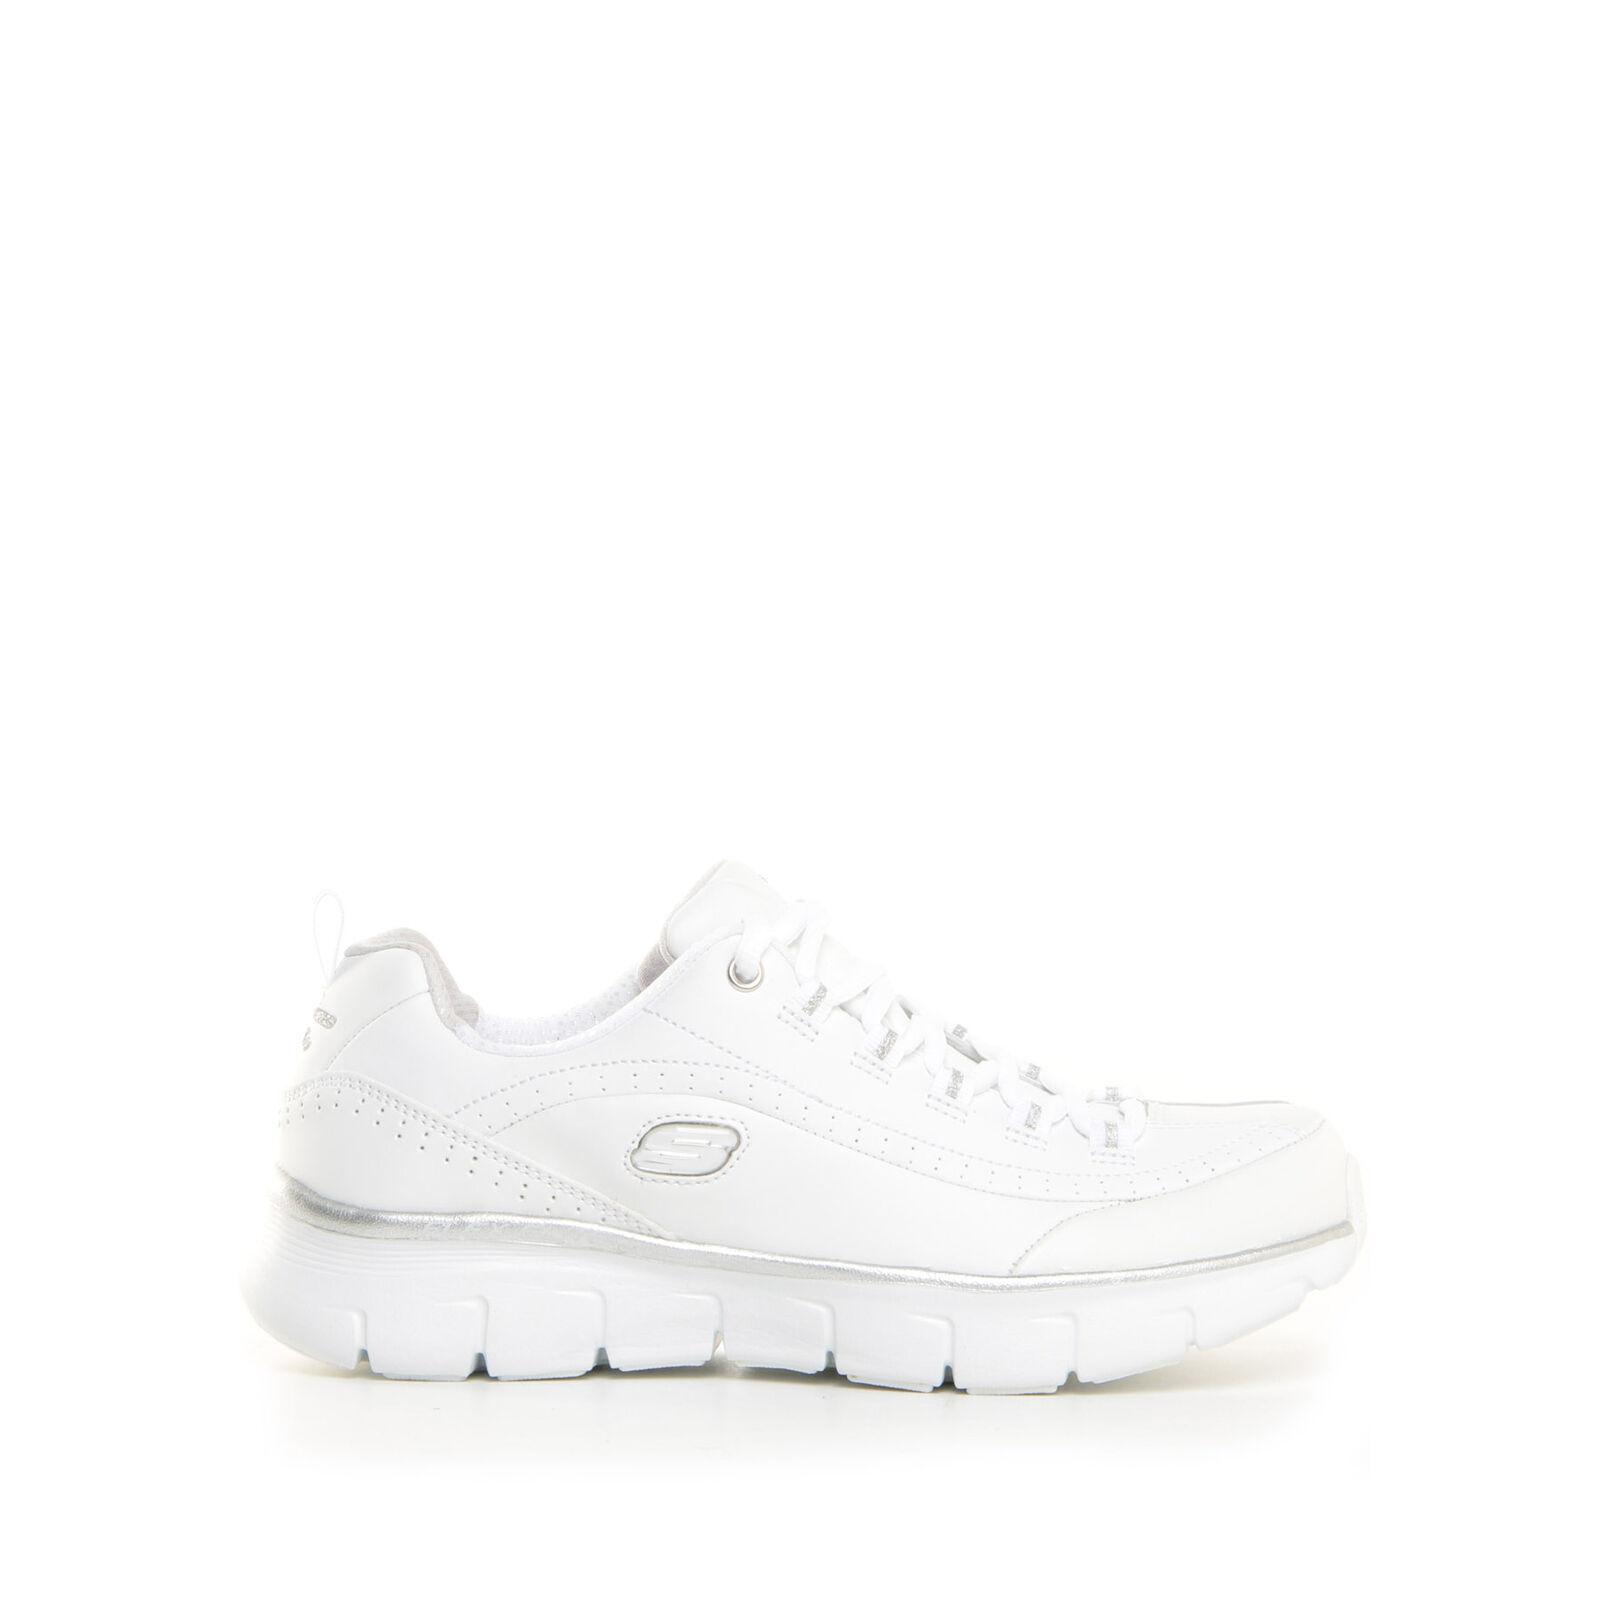 SKECHERS SYNERGY 3.0 3.0 3.0 zapatos FREE TIME mujer 13260 WSL  diseño único